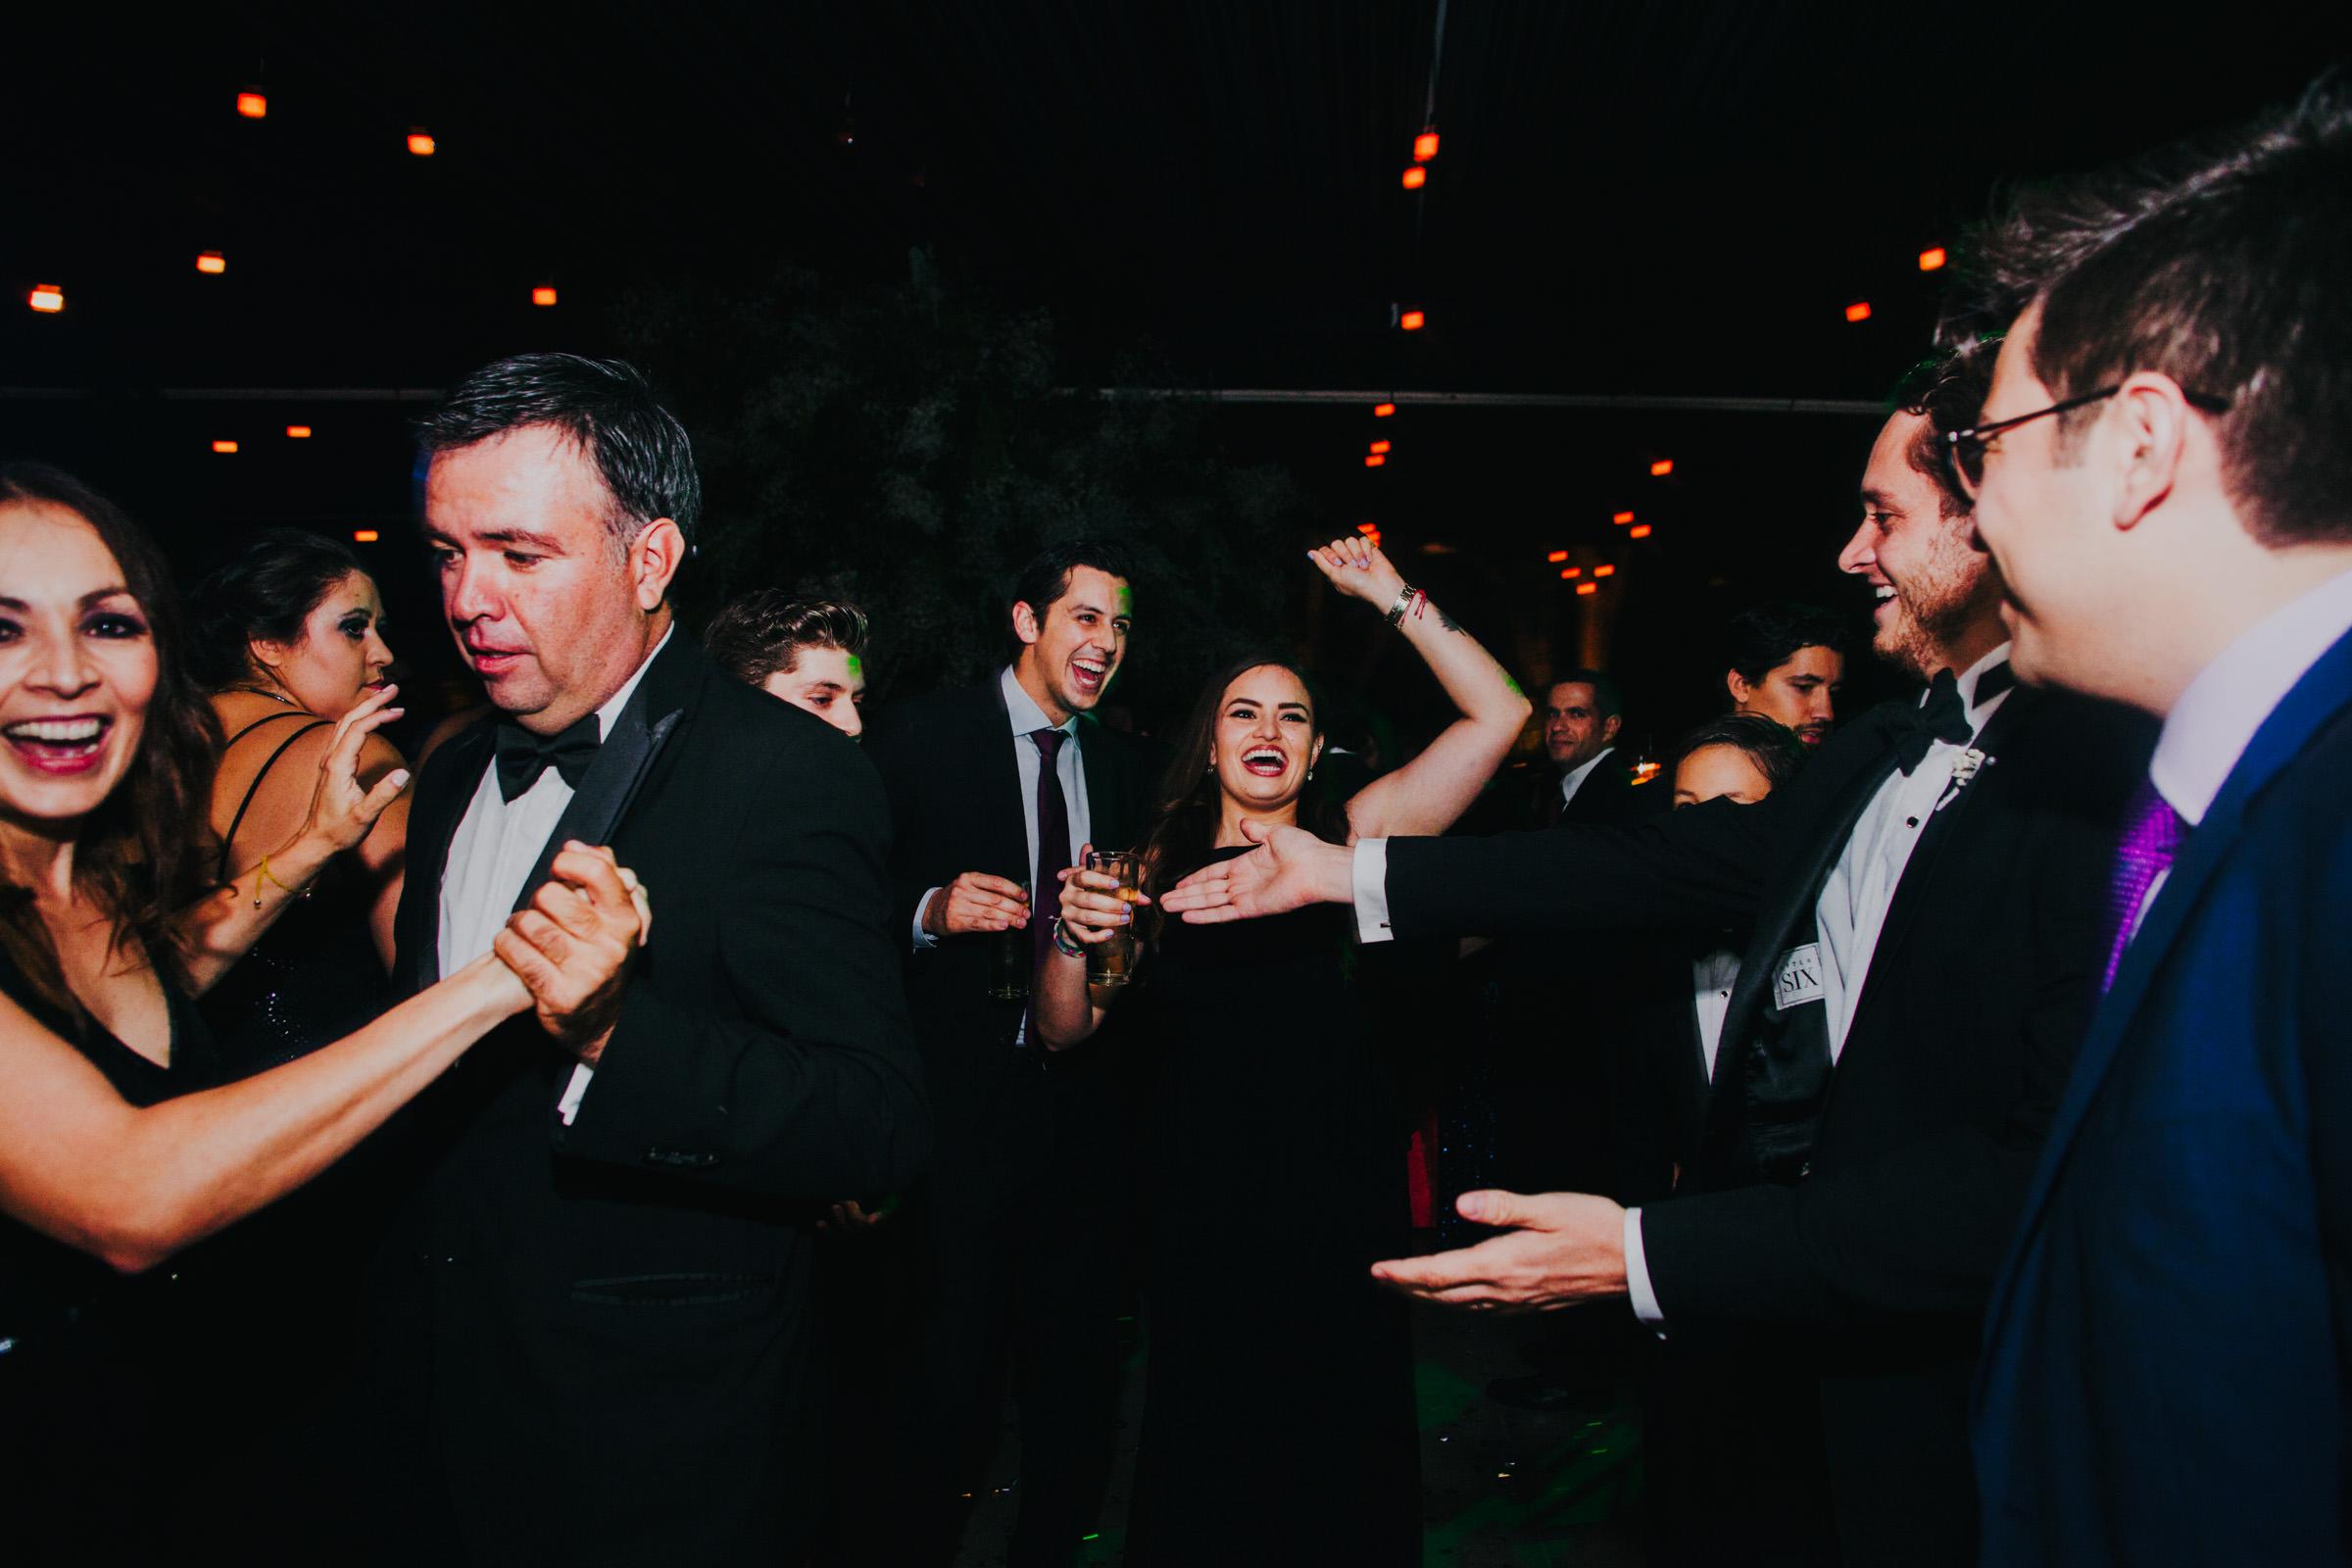 irapuato-boda-fotografia-jardines-alcalde-guanajuato-paulina-juan-pedro--153.jpg